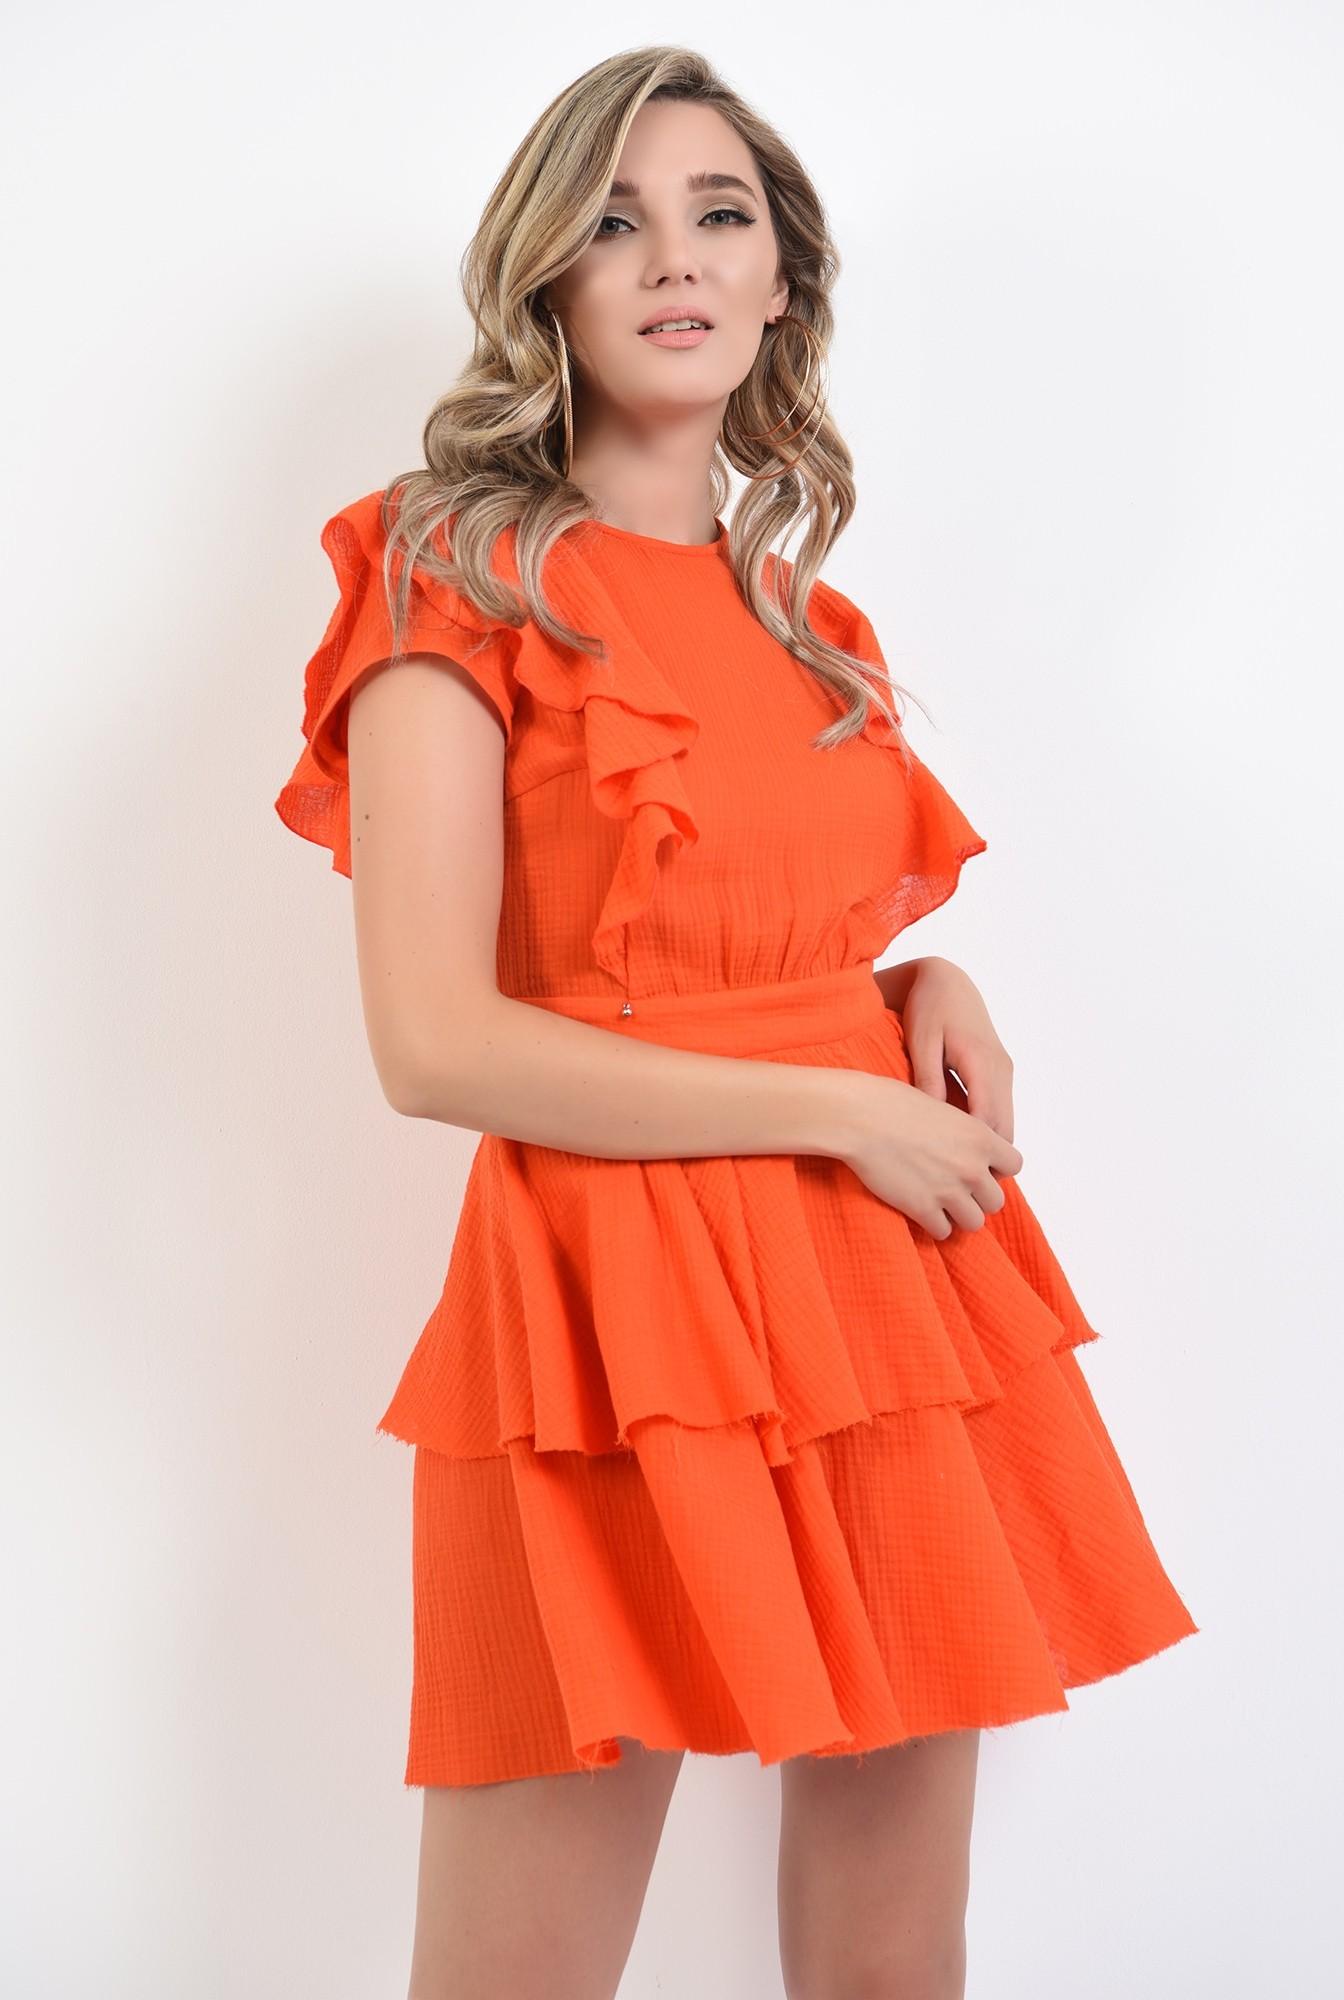 1 - 360 - rochie mini, orange, cu volane, Poema